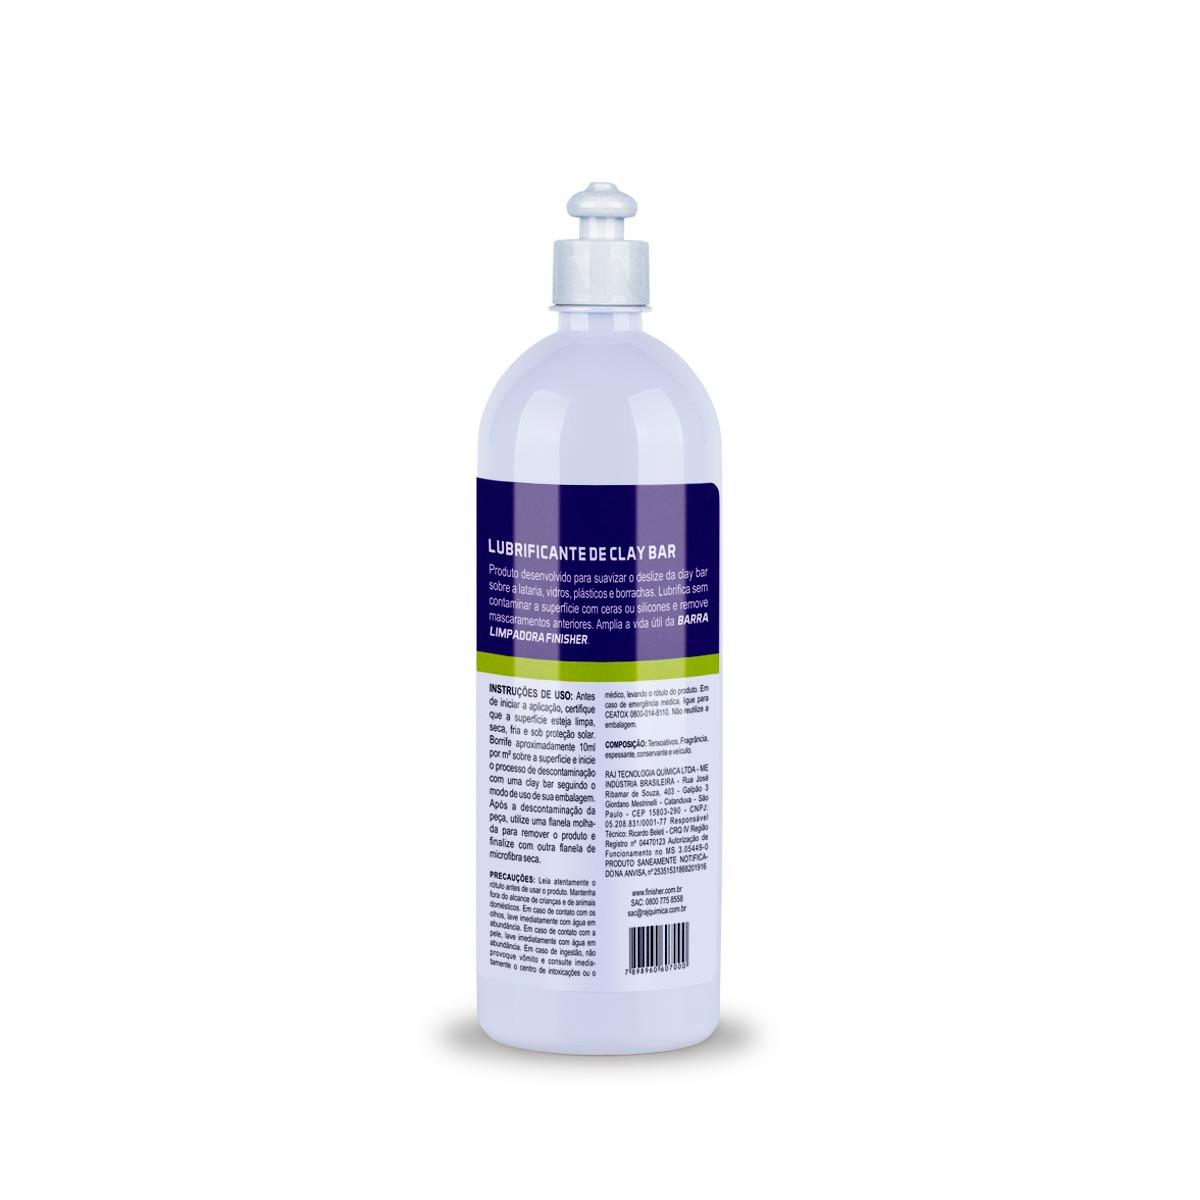 Lubrificante de Clay Bar Spray 1L - Finisher